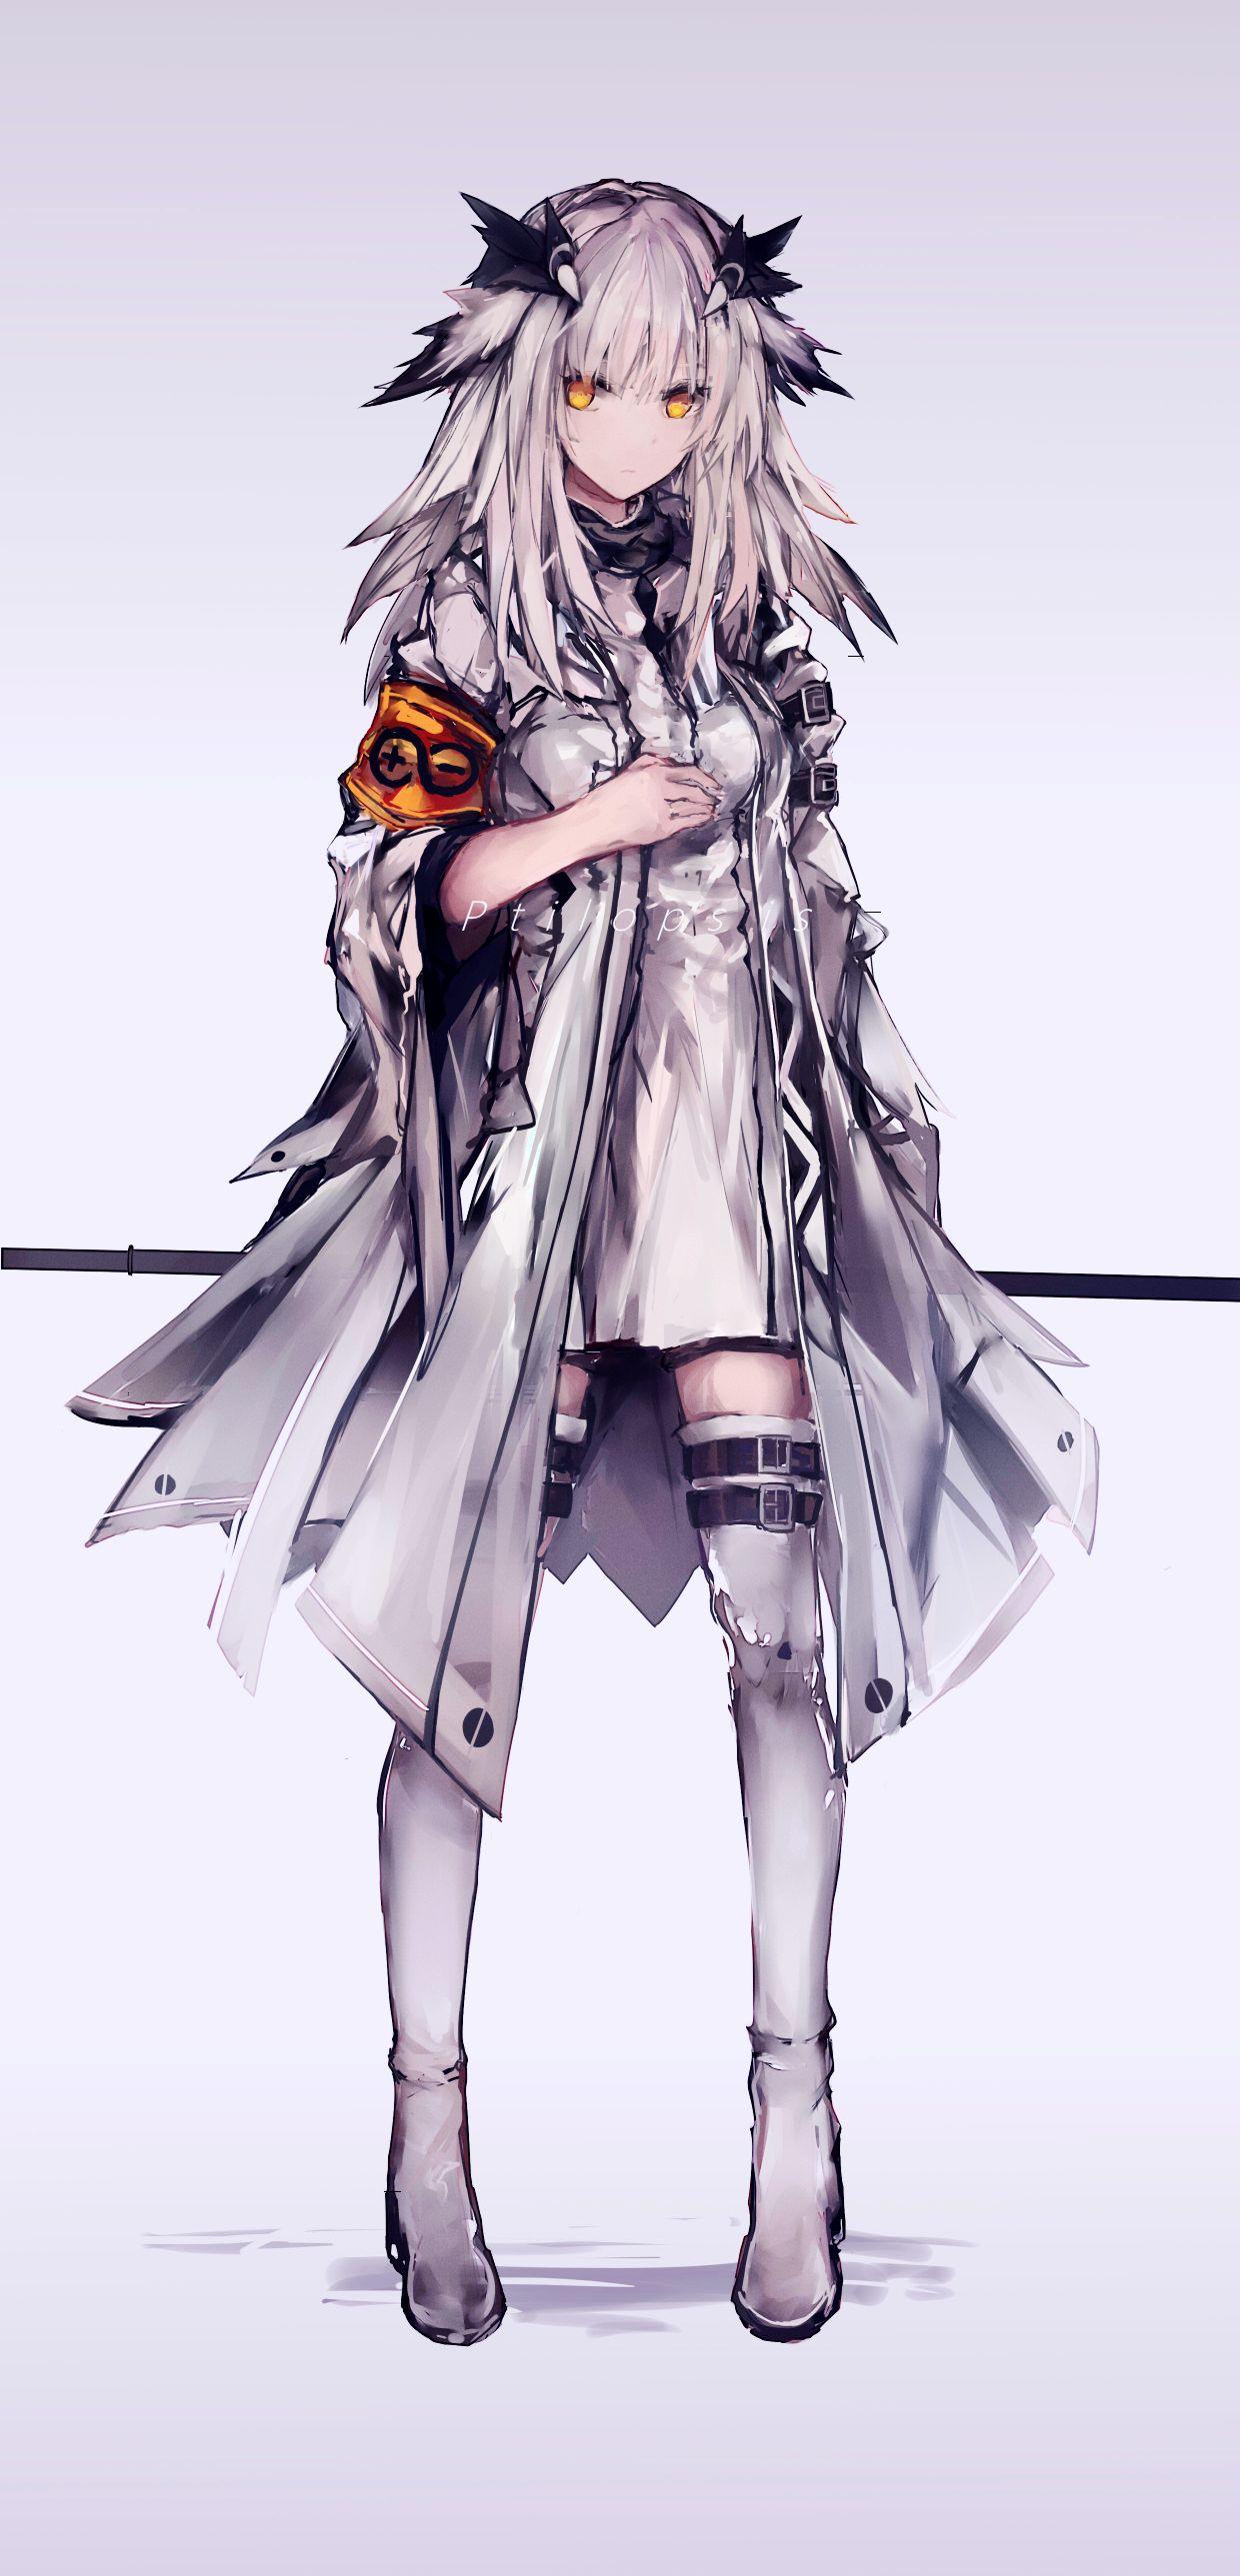 Anime 1240x2577 anime anime girls digital art artwork portrait display vertical white hair yellow eyes Arknights Ptilopsis(Arknights)